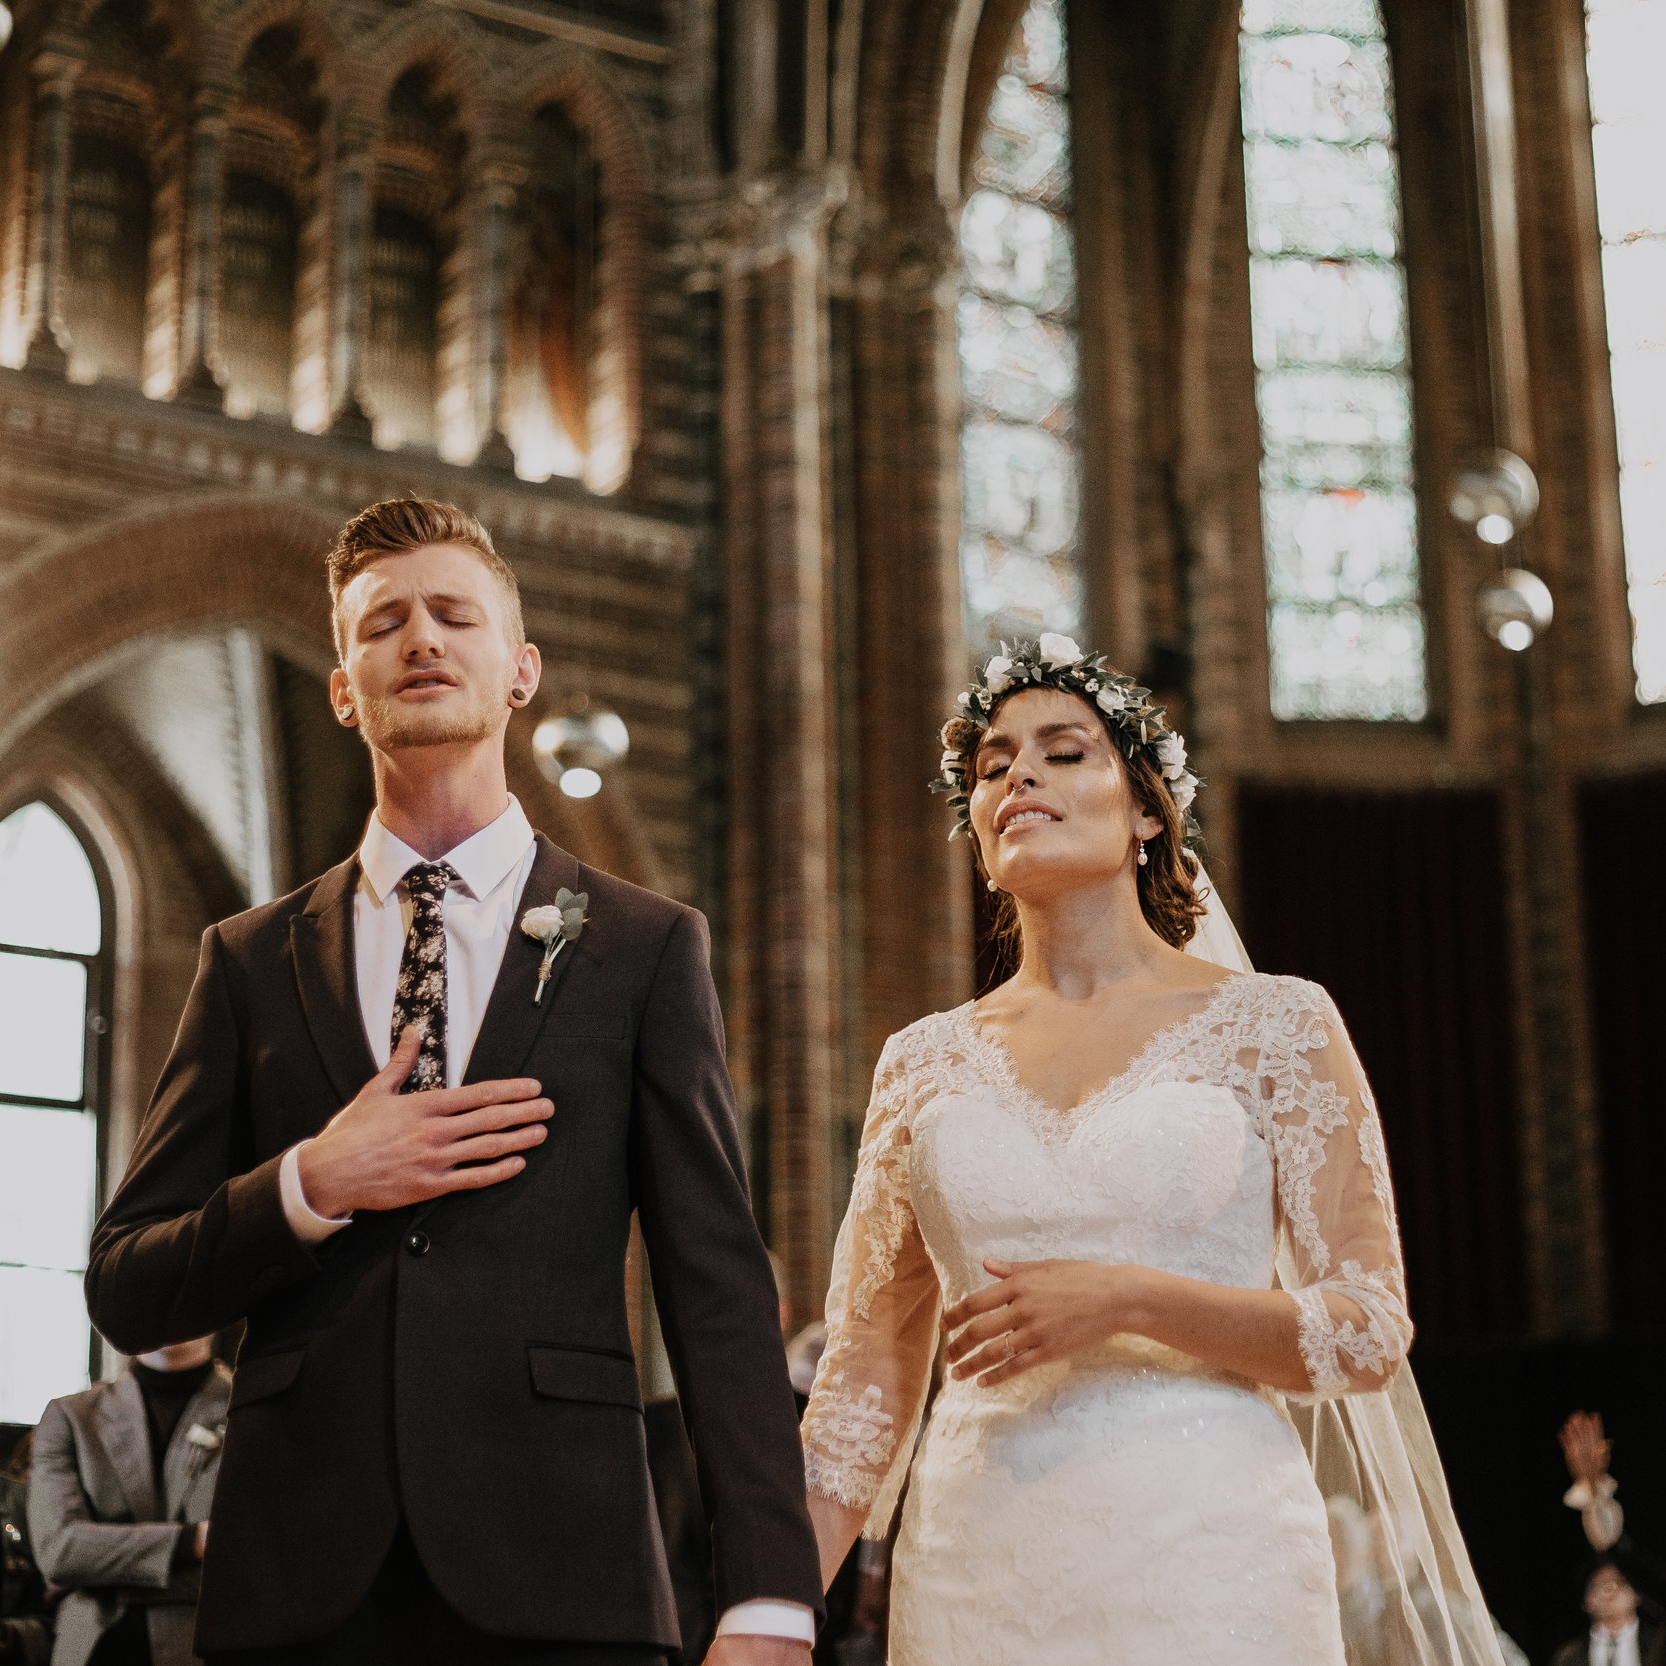 Ceremony church Wedding